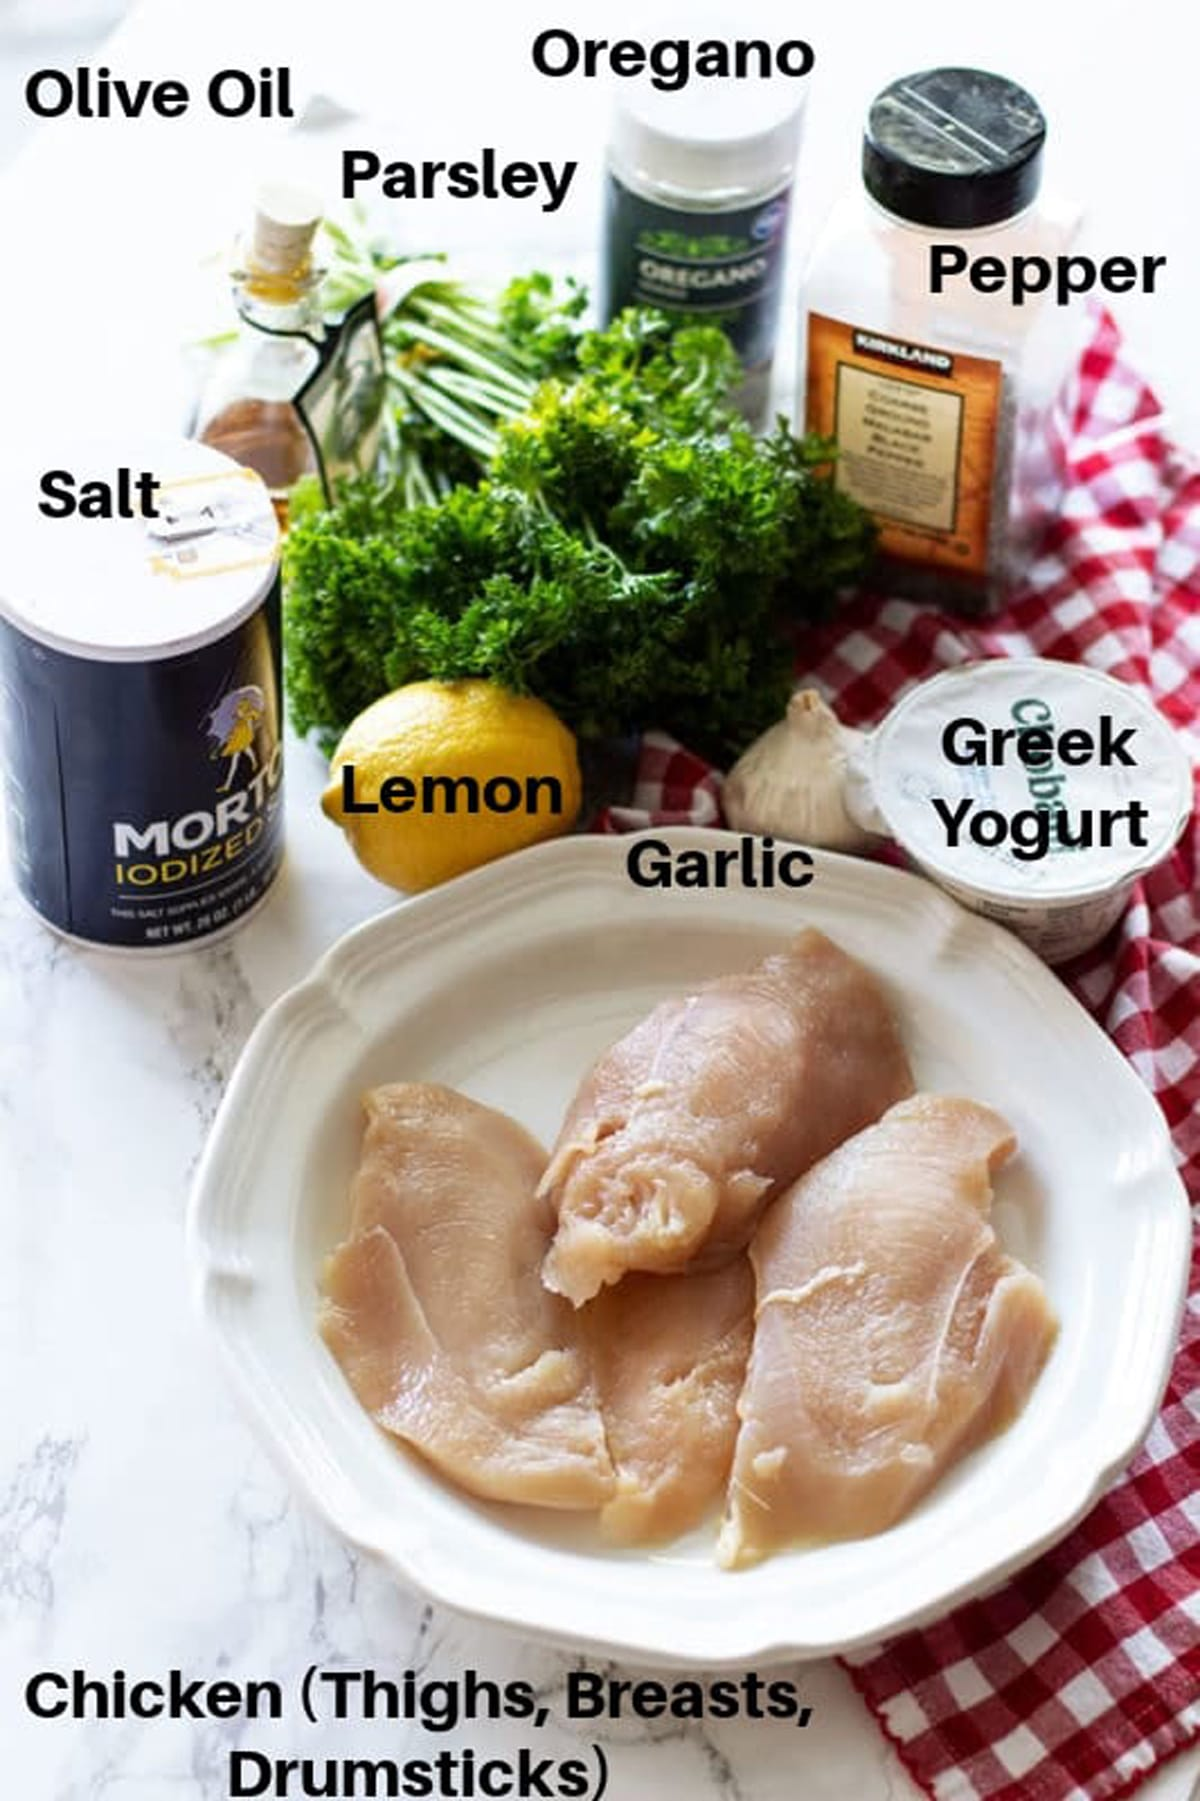 Chicken, lemon, greek yogurt, salt, pepper, oregano and parsley on a table.